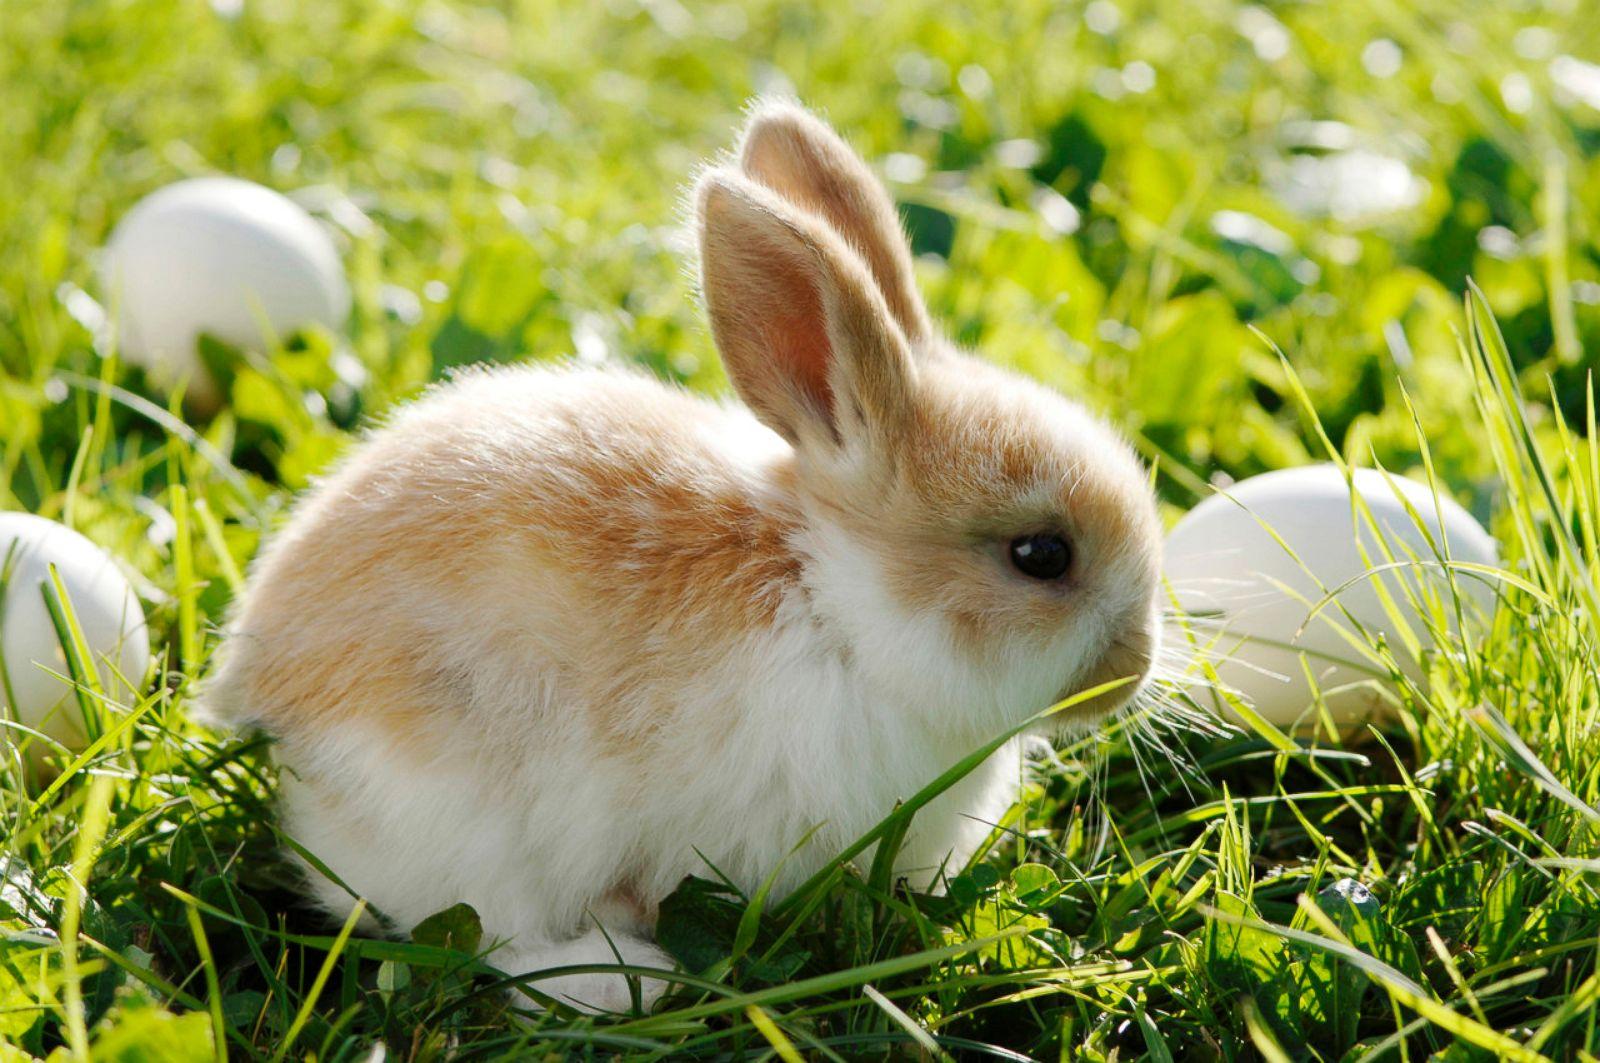 Cutest Easter Bunnies ...